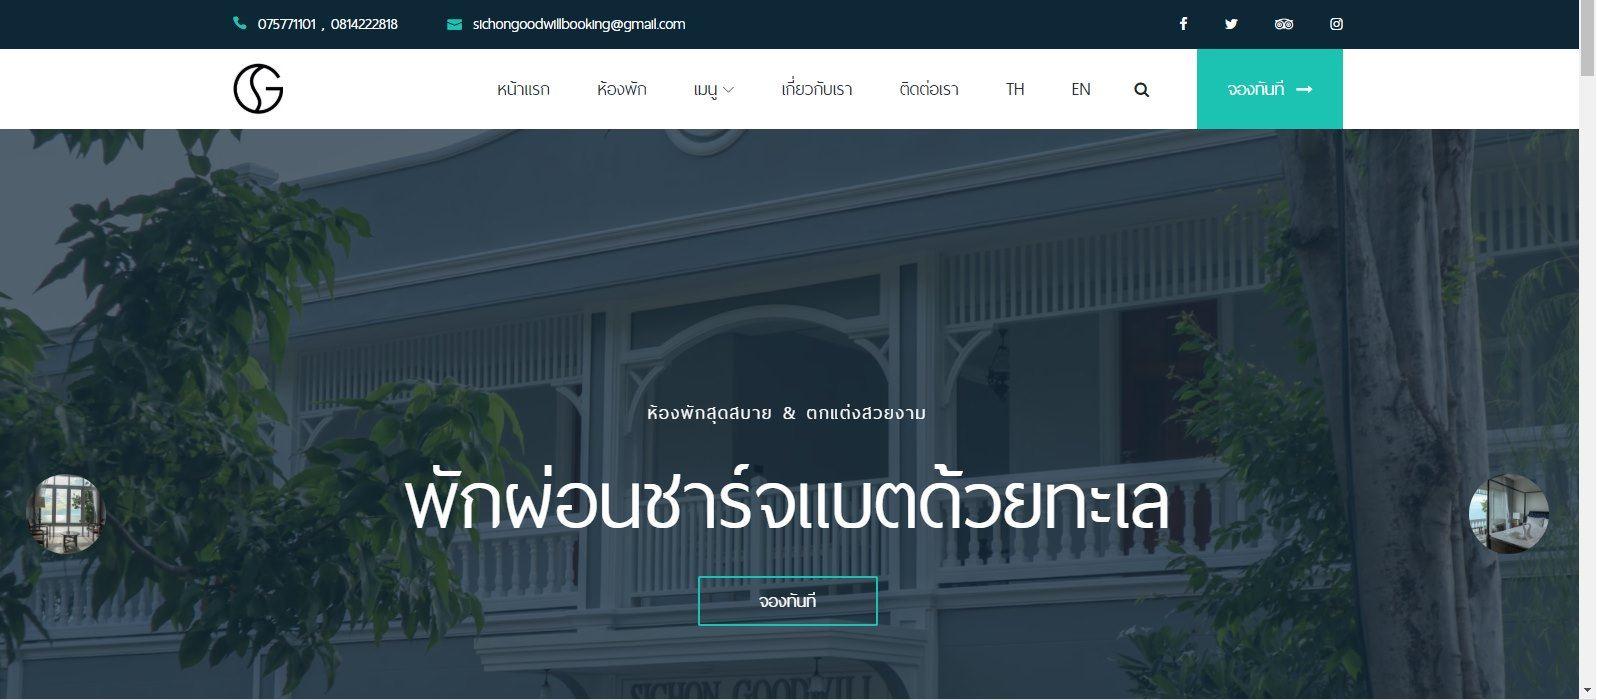 Design-การออกแบบโรงแรมริมทะเล  รับทำเว็บไซต์,ภาคใต้,application,ios,android